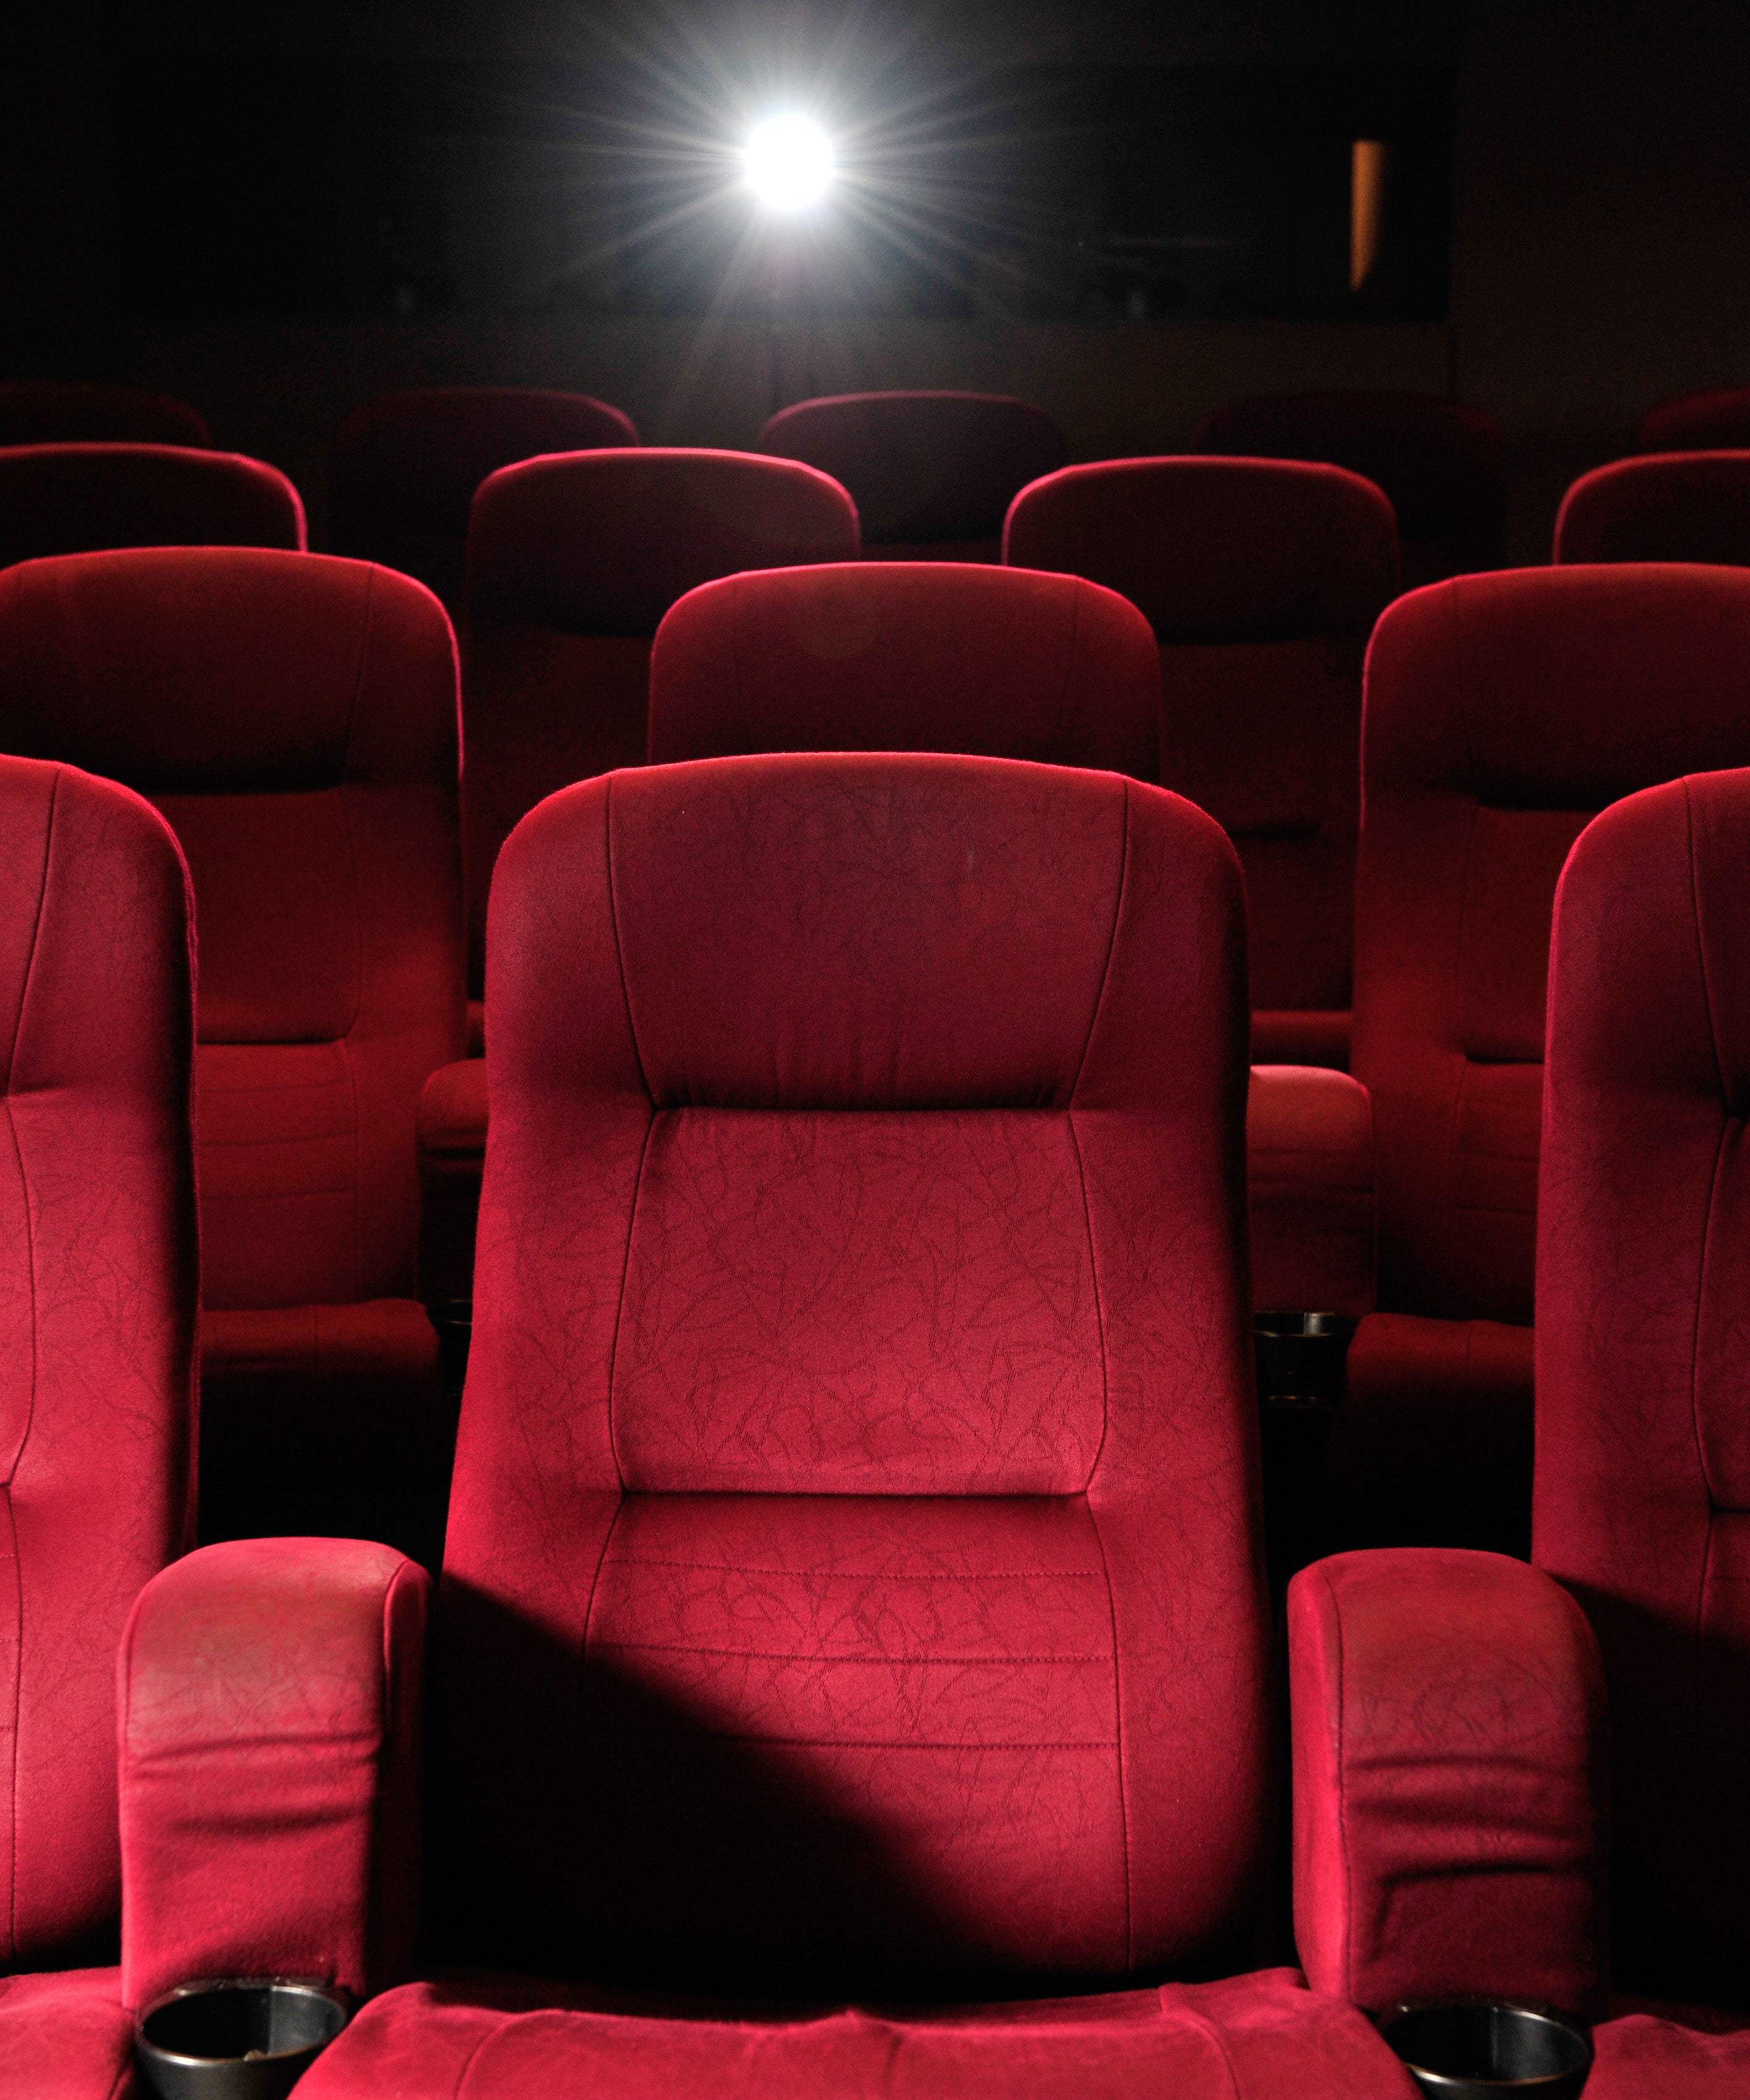 Movie Theaters Closed Limited Seats During Coronavirus